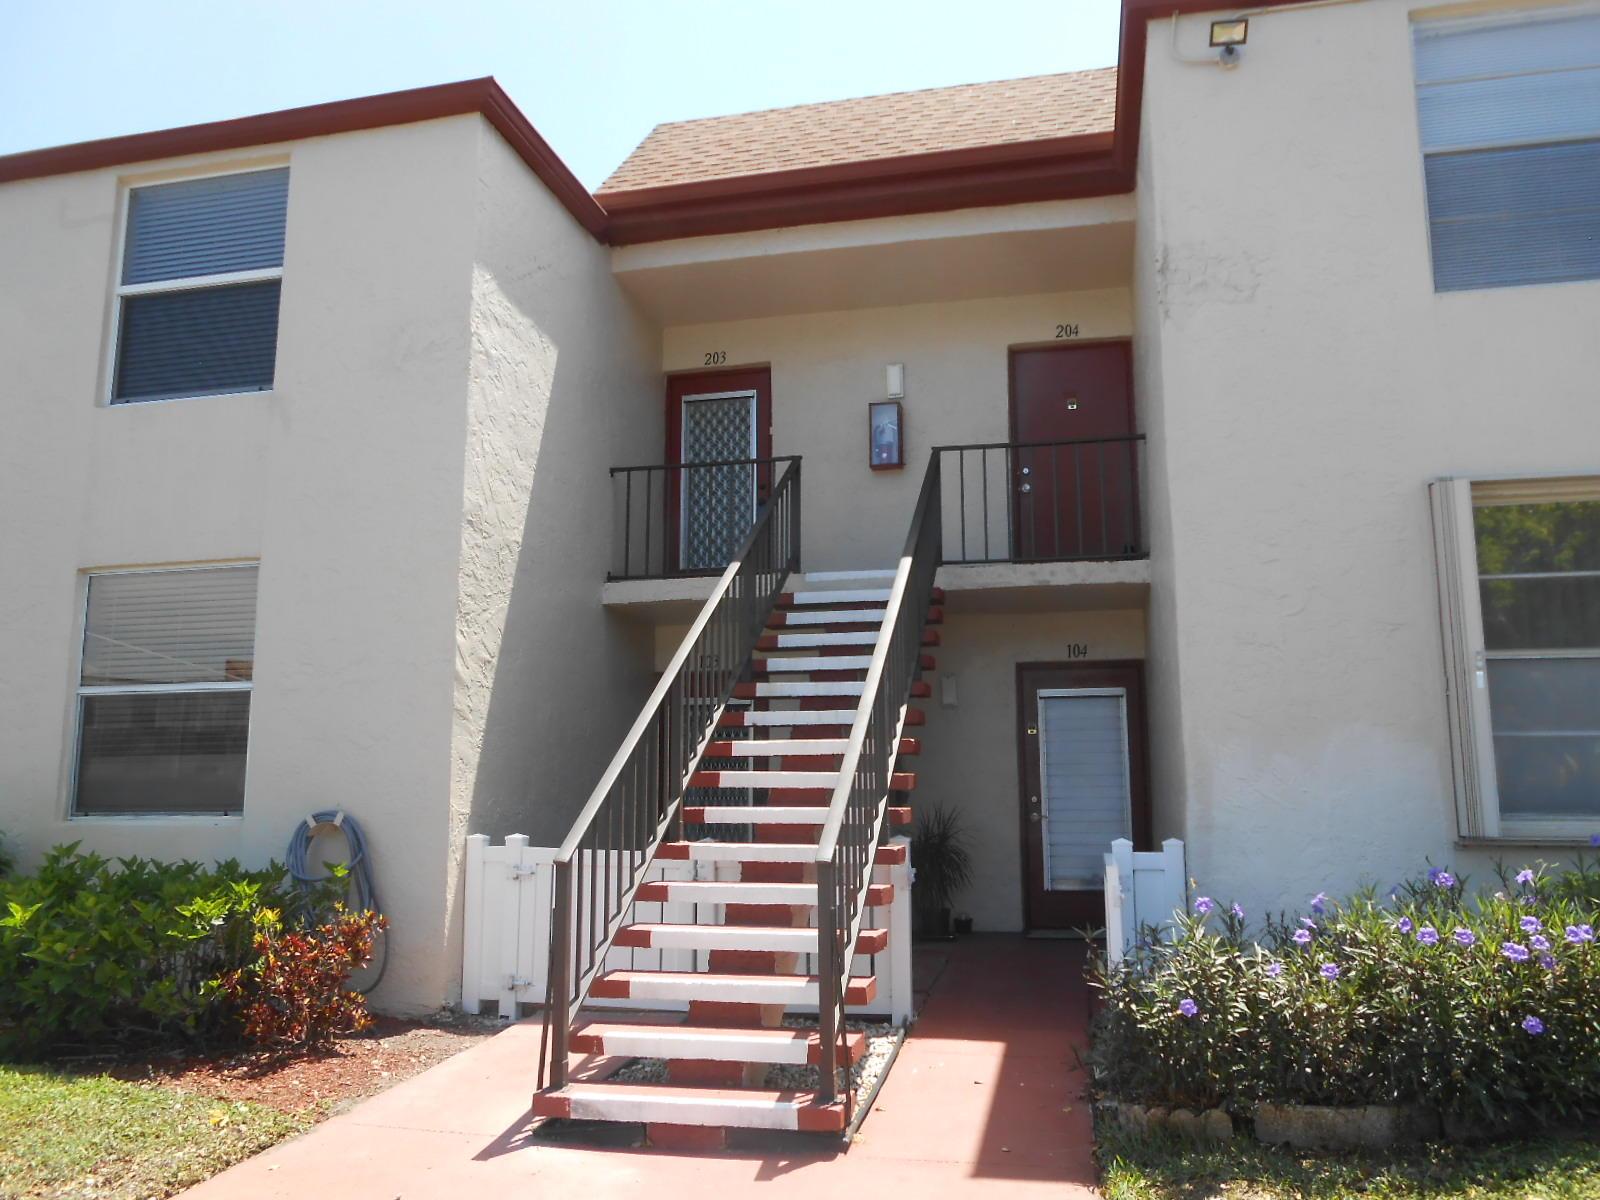 16 Willowbrook Lane 203  Delray Beach, FL 33446